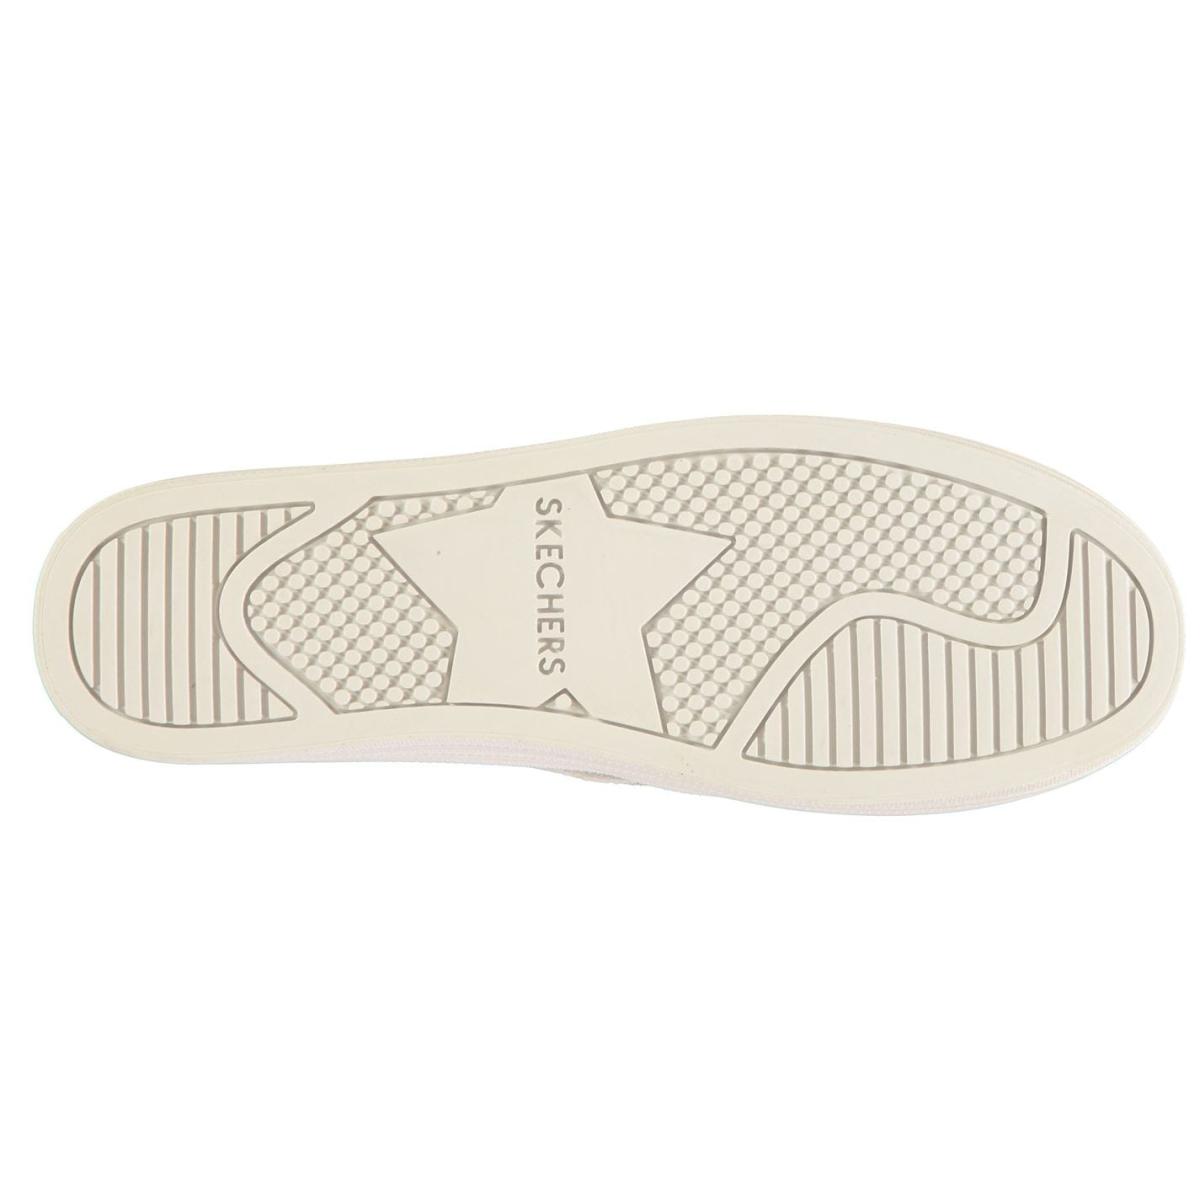 Skechers-Damen-Turnschuhe-Laufschuhe-Sneakers-Sportschuhe-Du-Shiny-4473 Indexbild 6